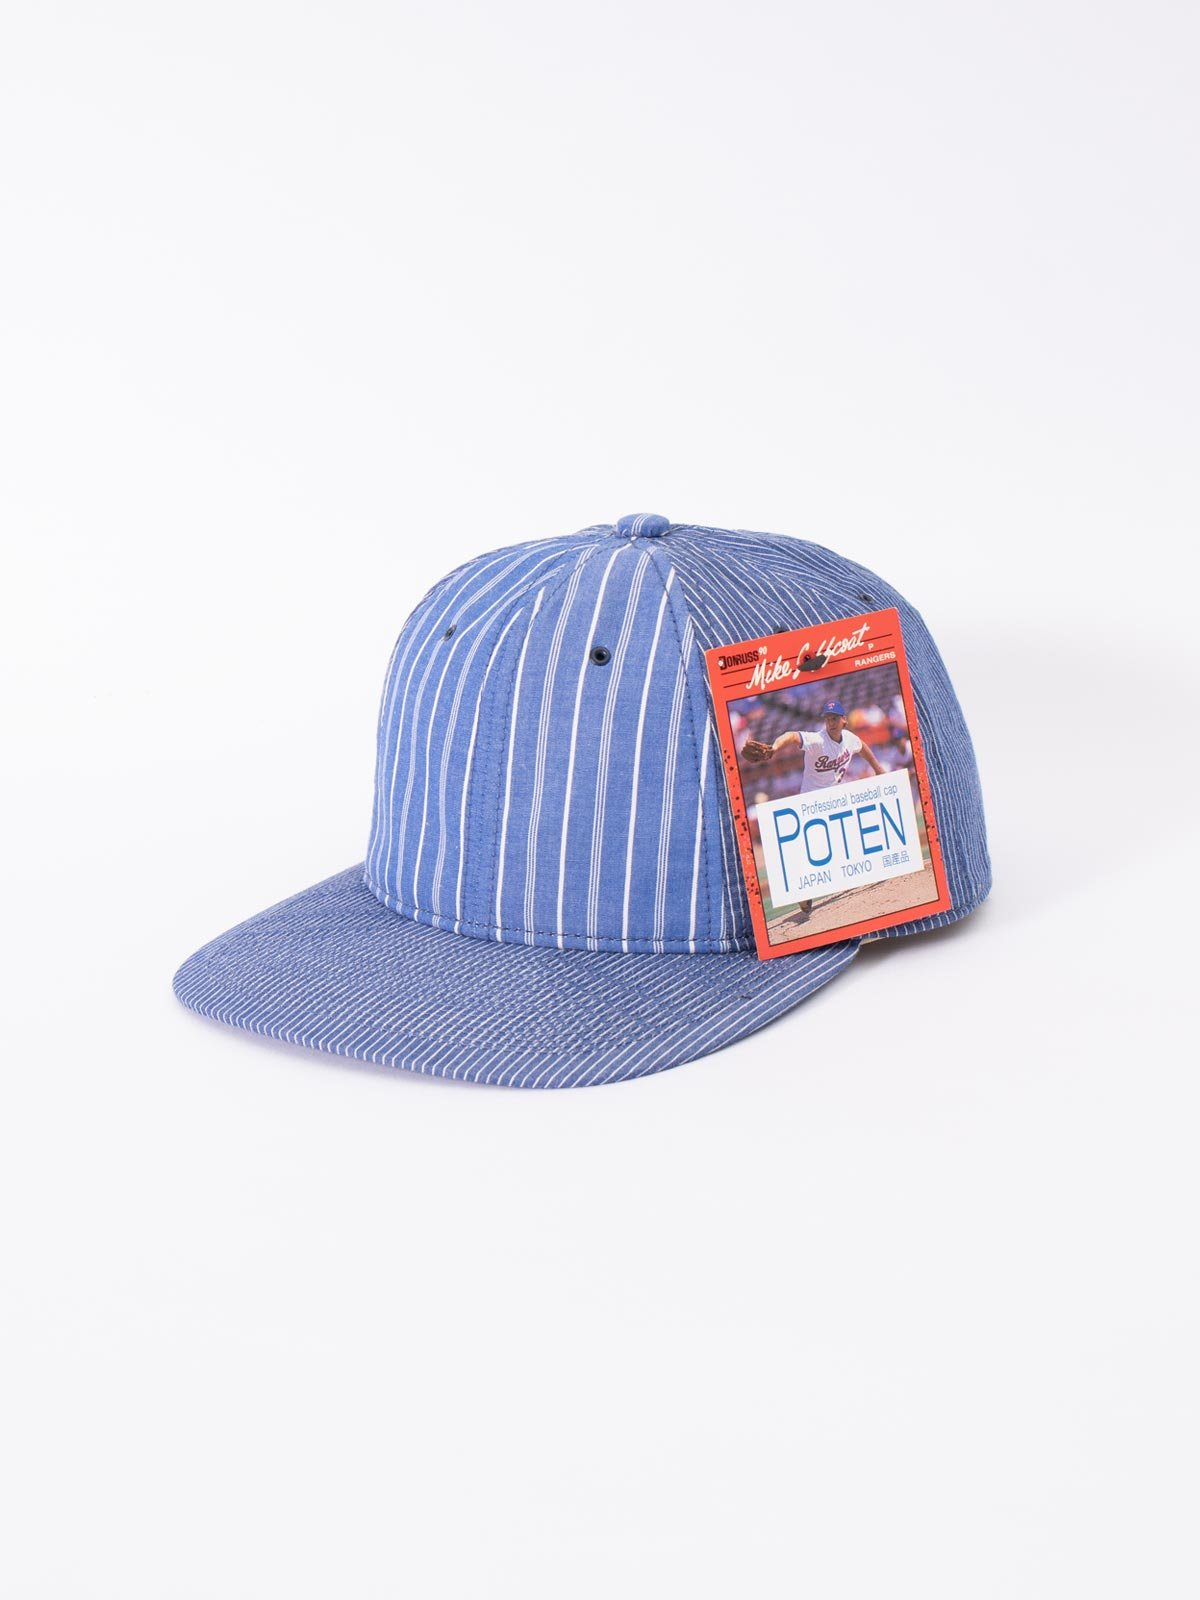 BLUE JAPANESE CHAMBRAY CAP - Image 1